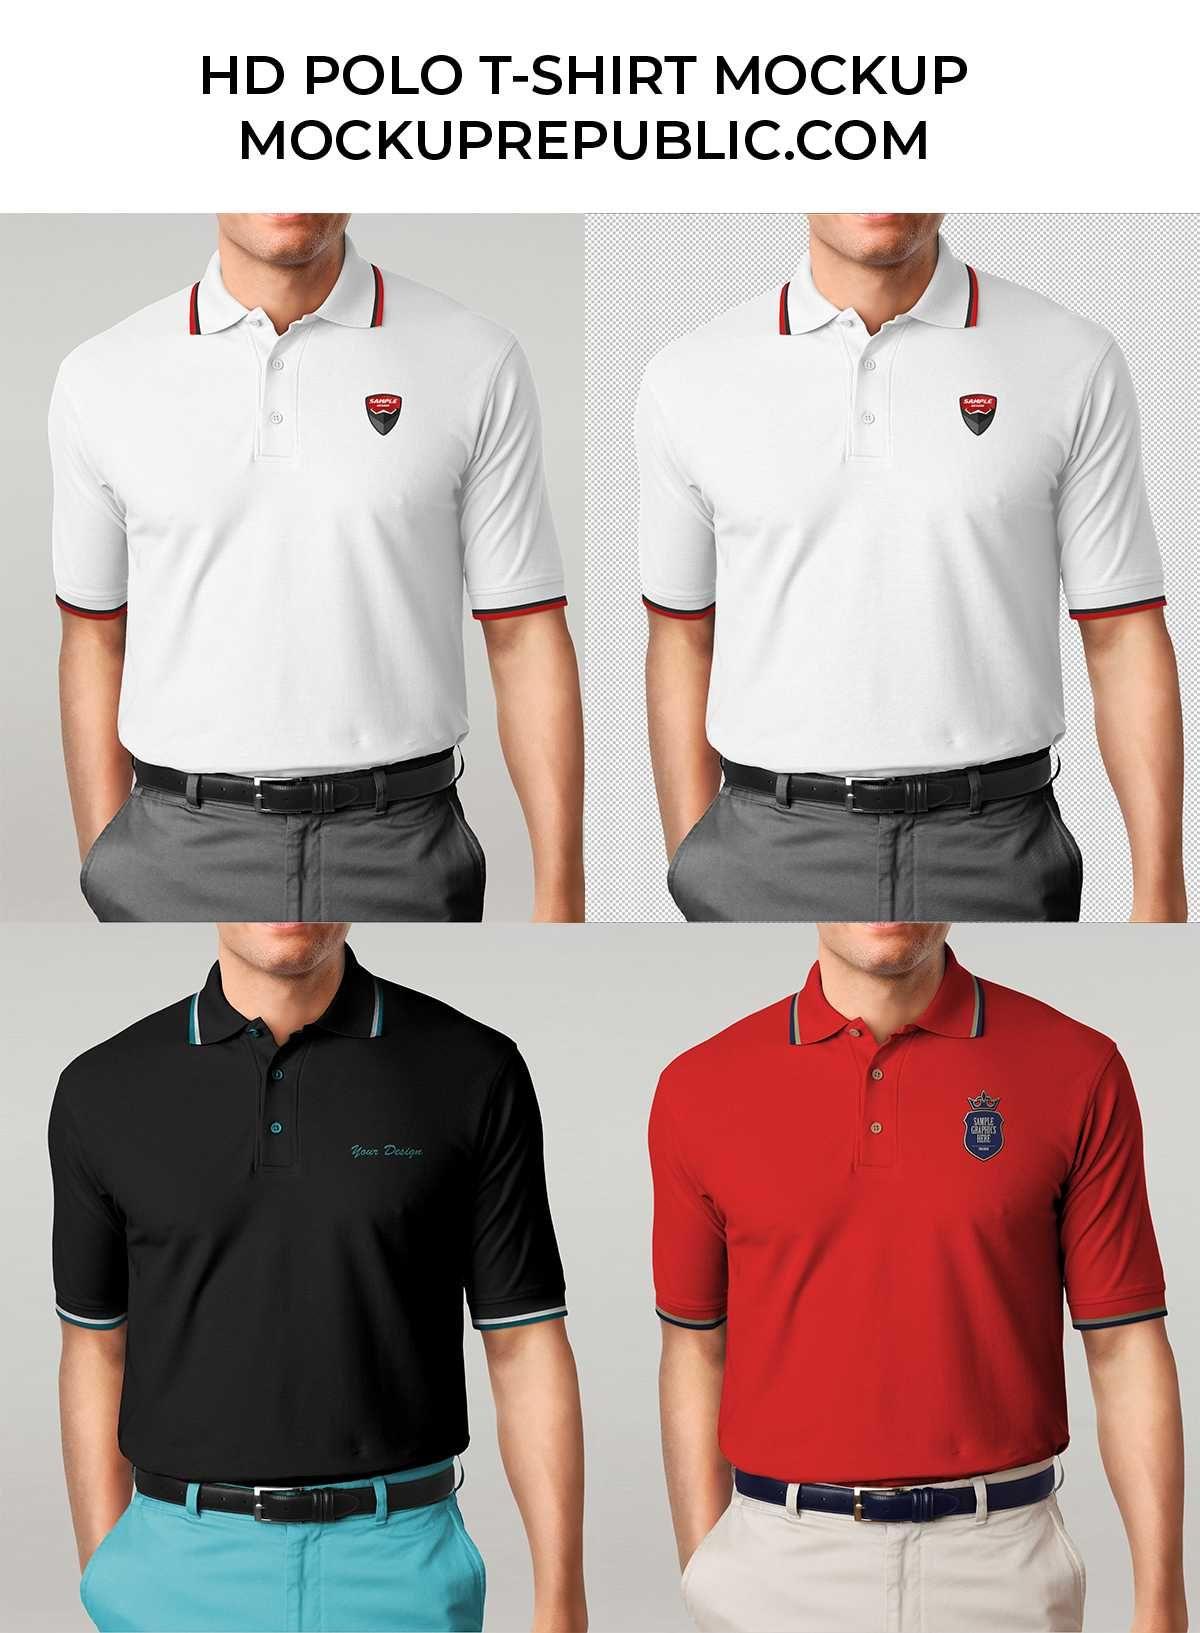 Polo T Shirt Mockup Front And Back Psd Free Hd Man Polo T Shirt Mockup